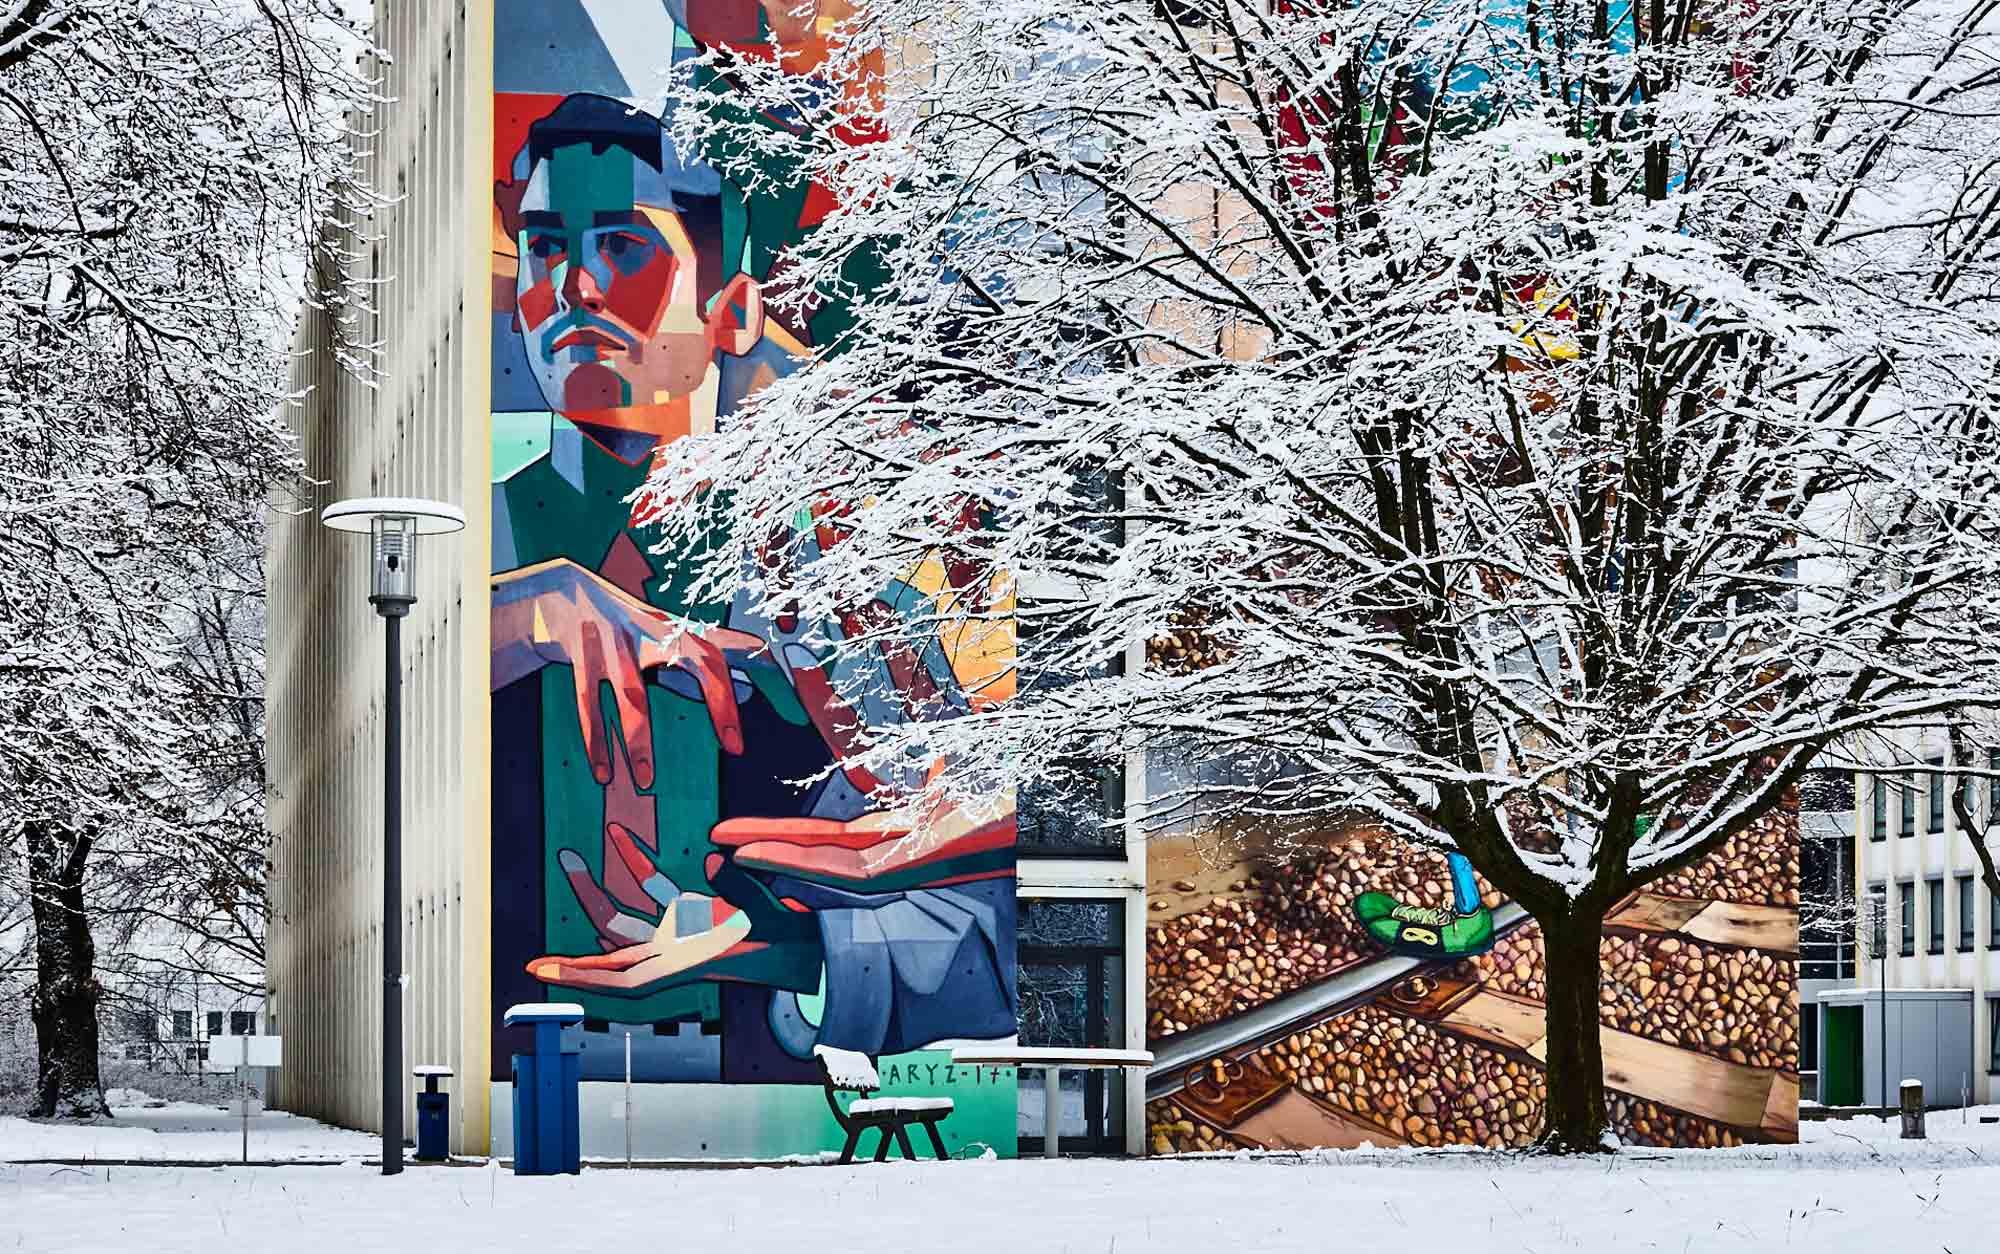 Scale-Street-Art-Siemens-Gelaende-Muenchen-2017--5-1-1